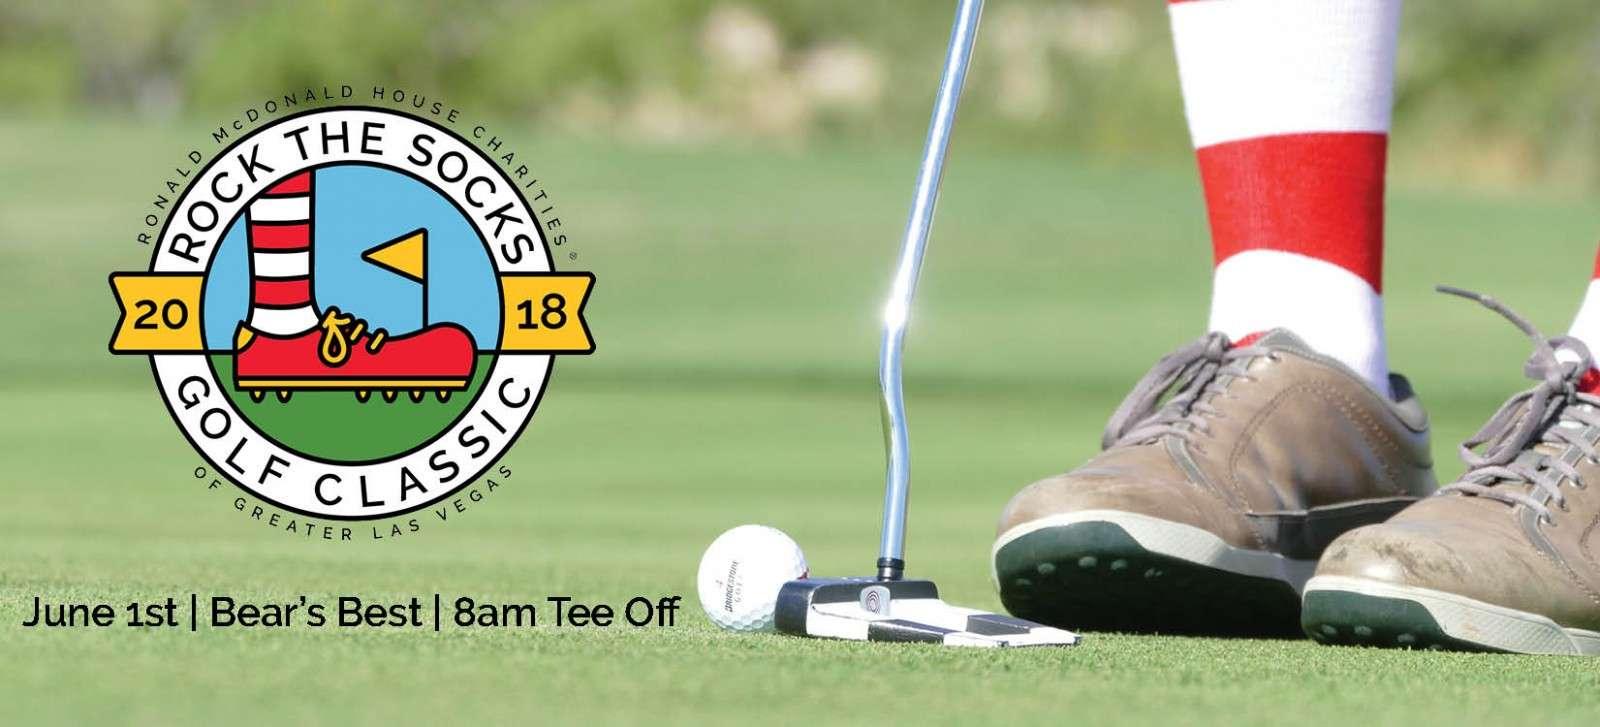 Rock the Socks Golf Classic Group Photo